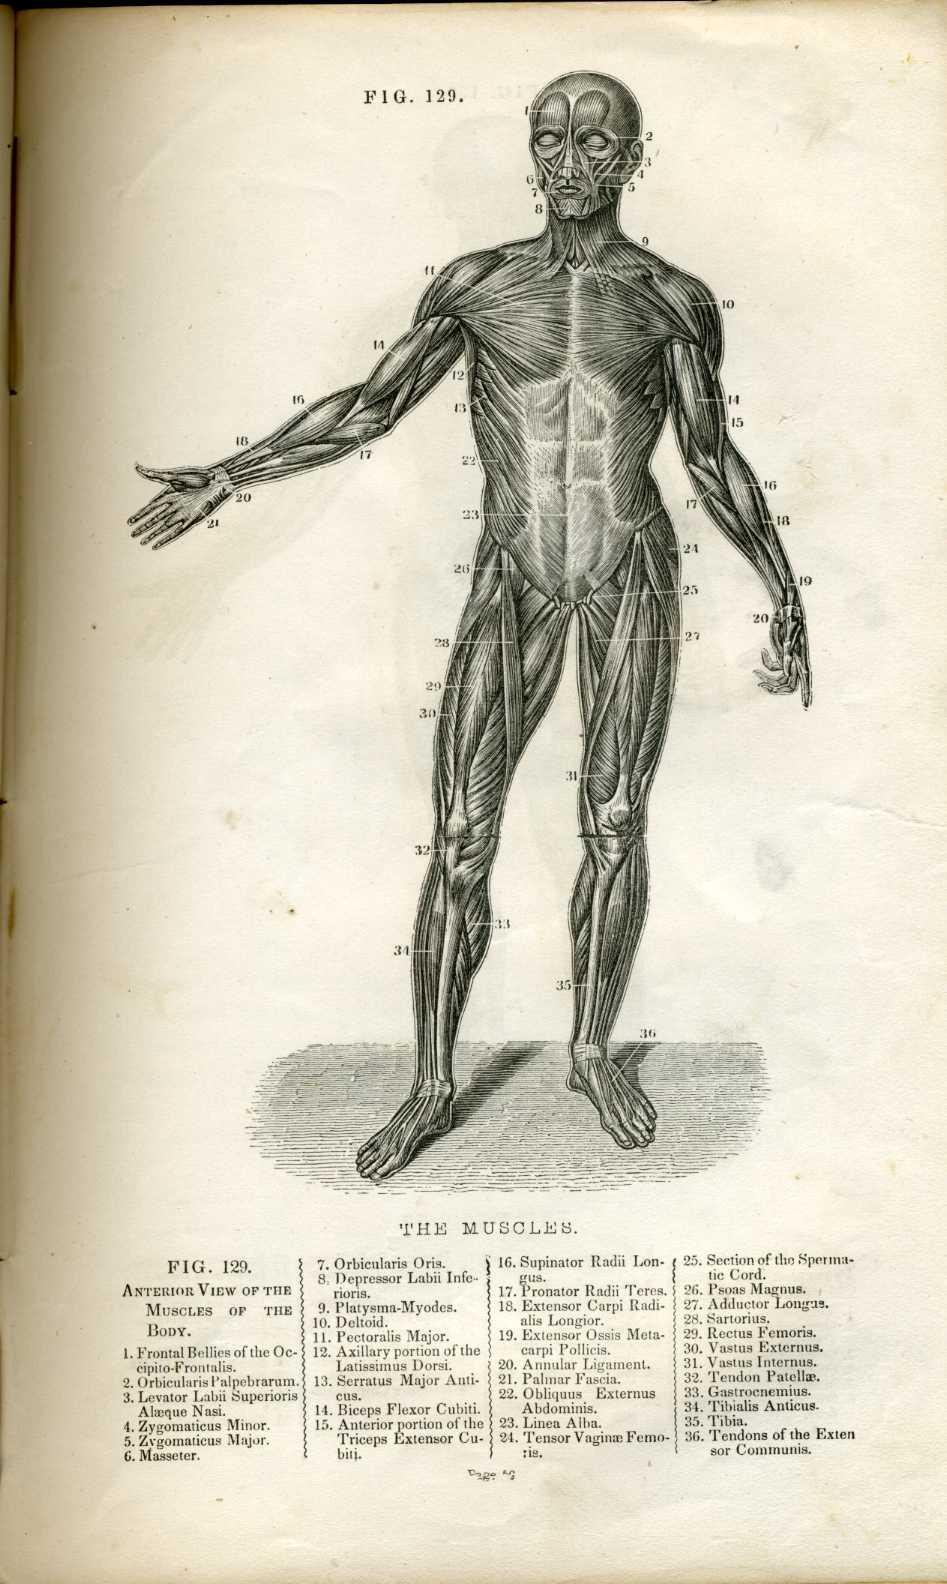 Atlas Anatomy Human Body Gallery Human Internal Organs Diagram